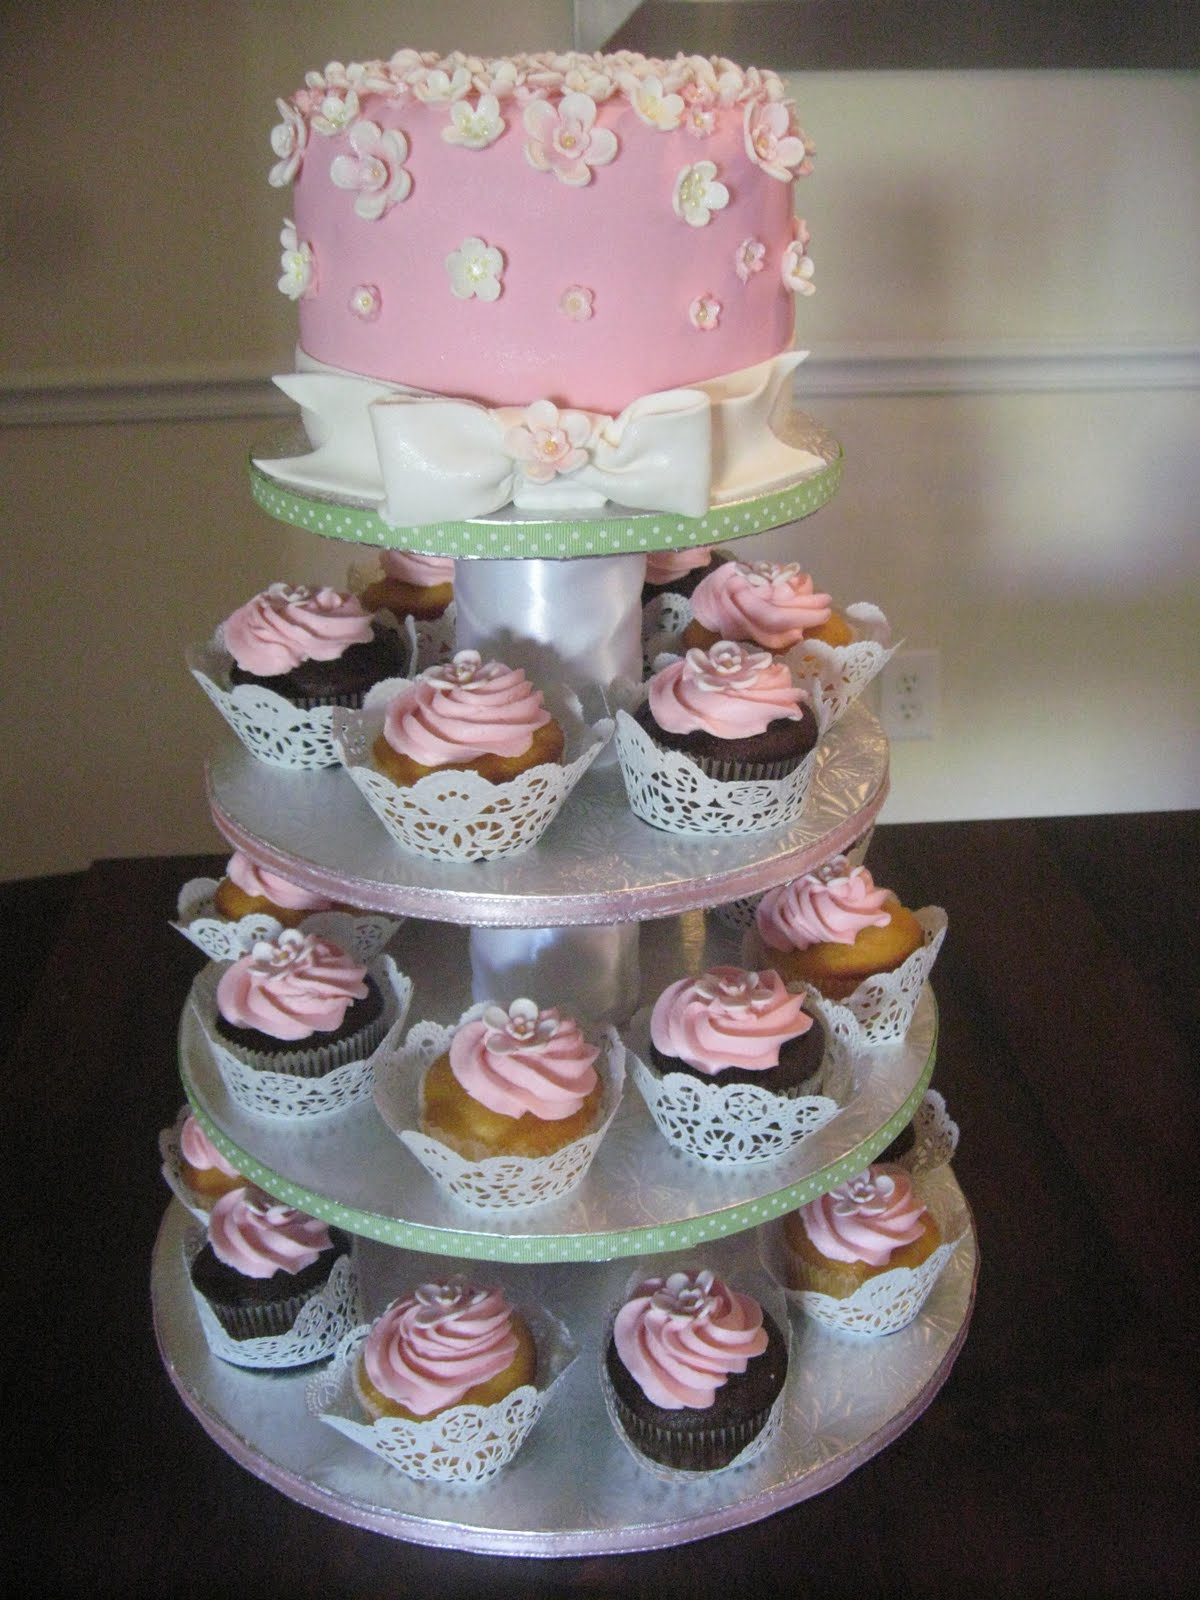 cupcakes shower cakes baptisms cake smash cake pink cake baby